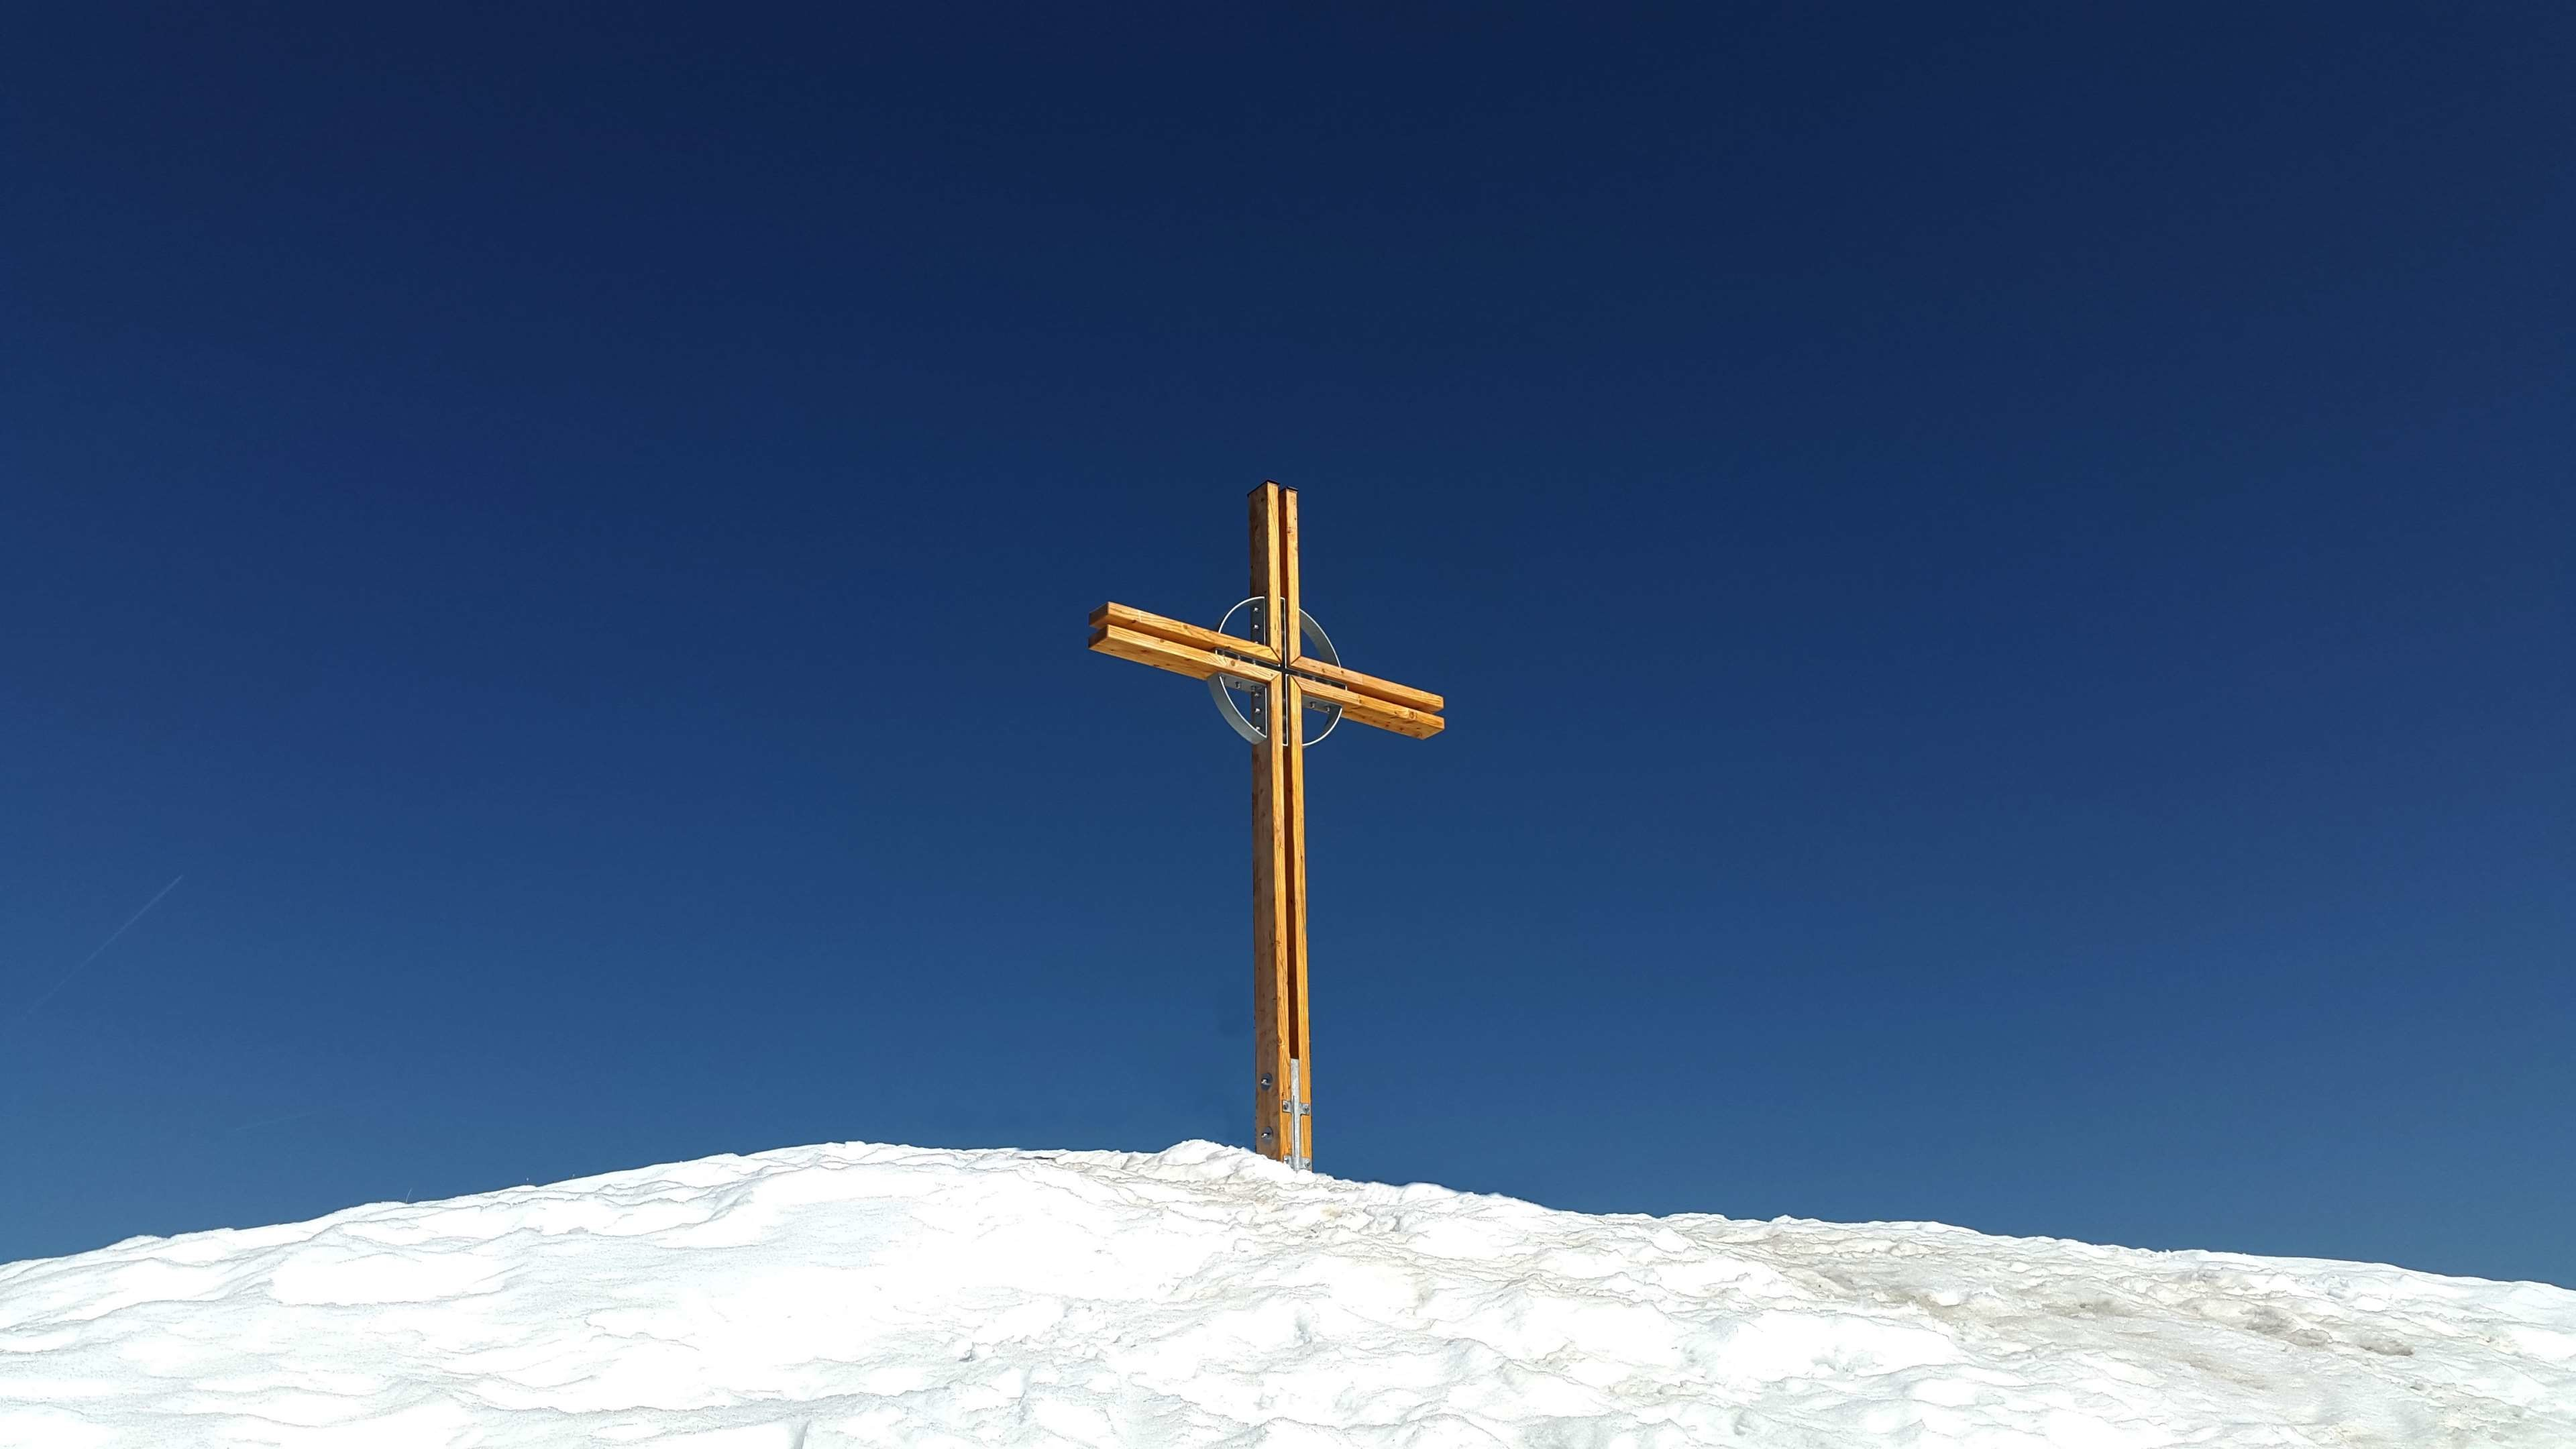 Res: 3840x2160,  alpine, blue sky, cross, hike, kleinwalsertal, kuhgehrenspitze,  mountain,